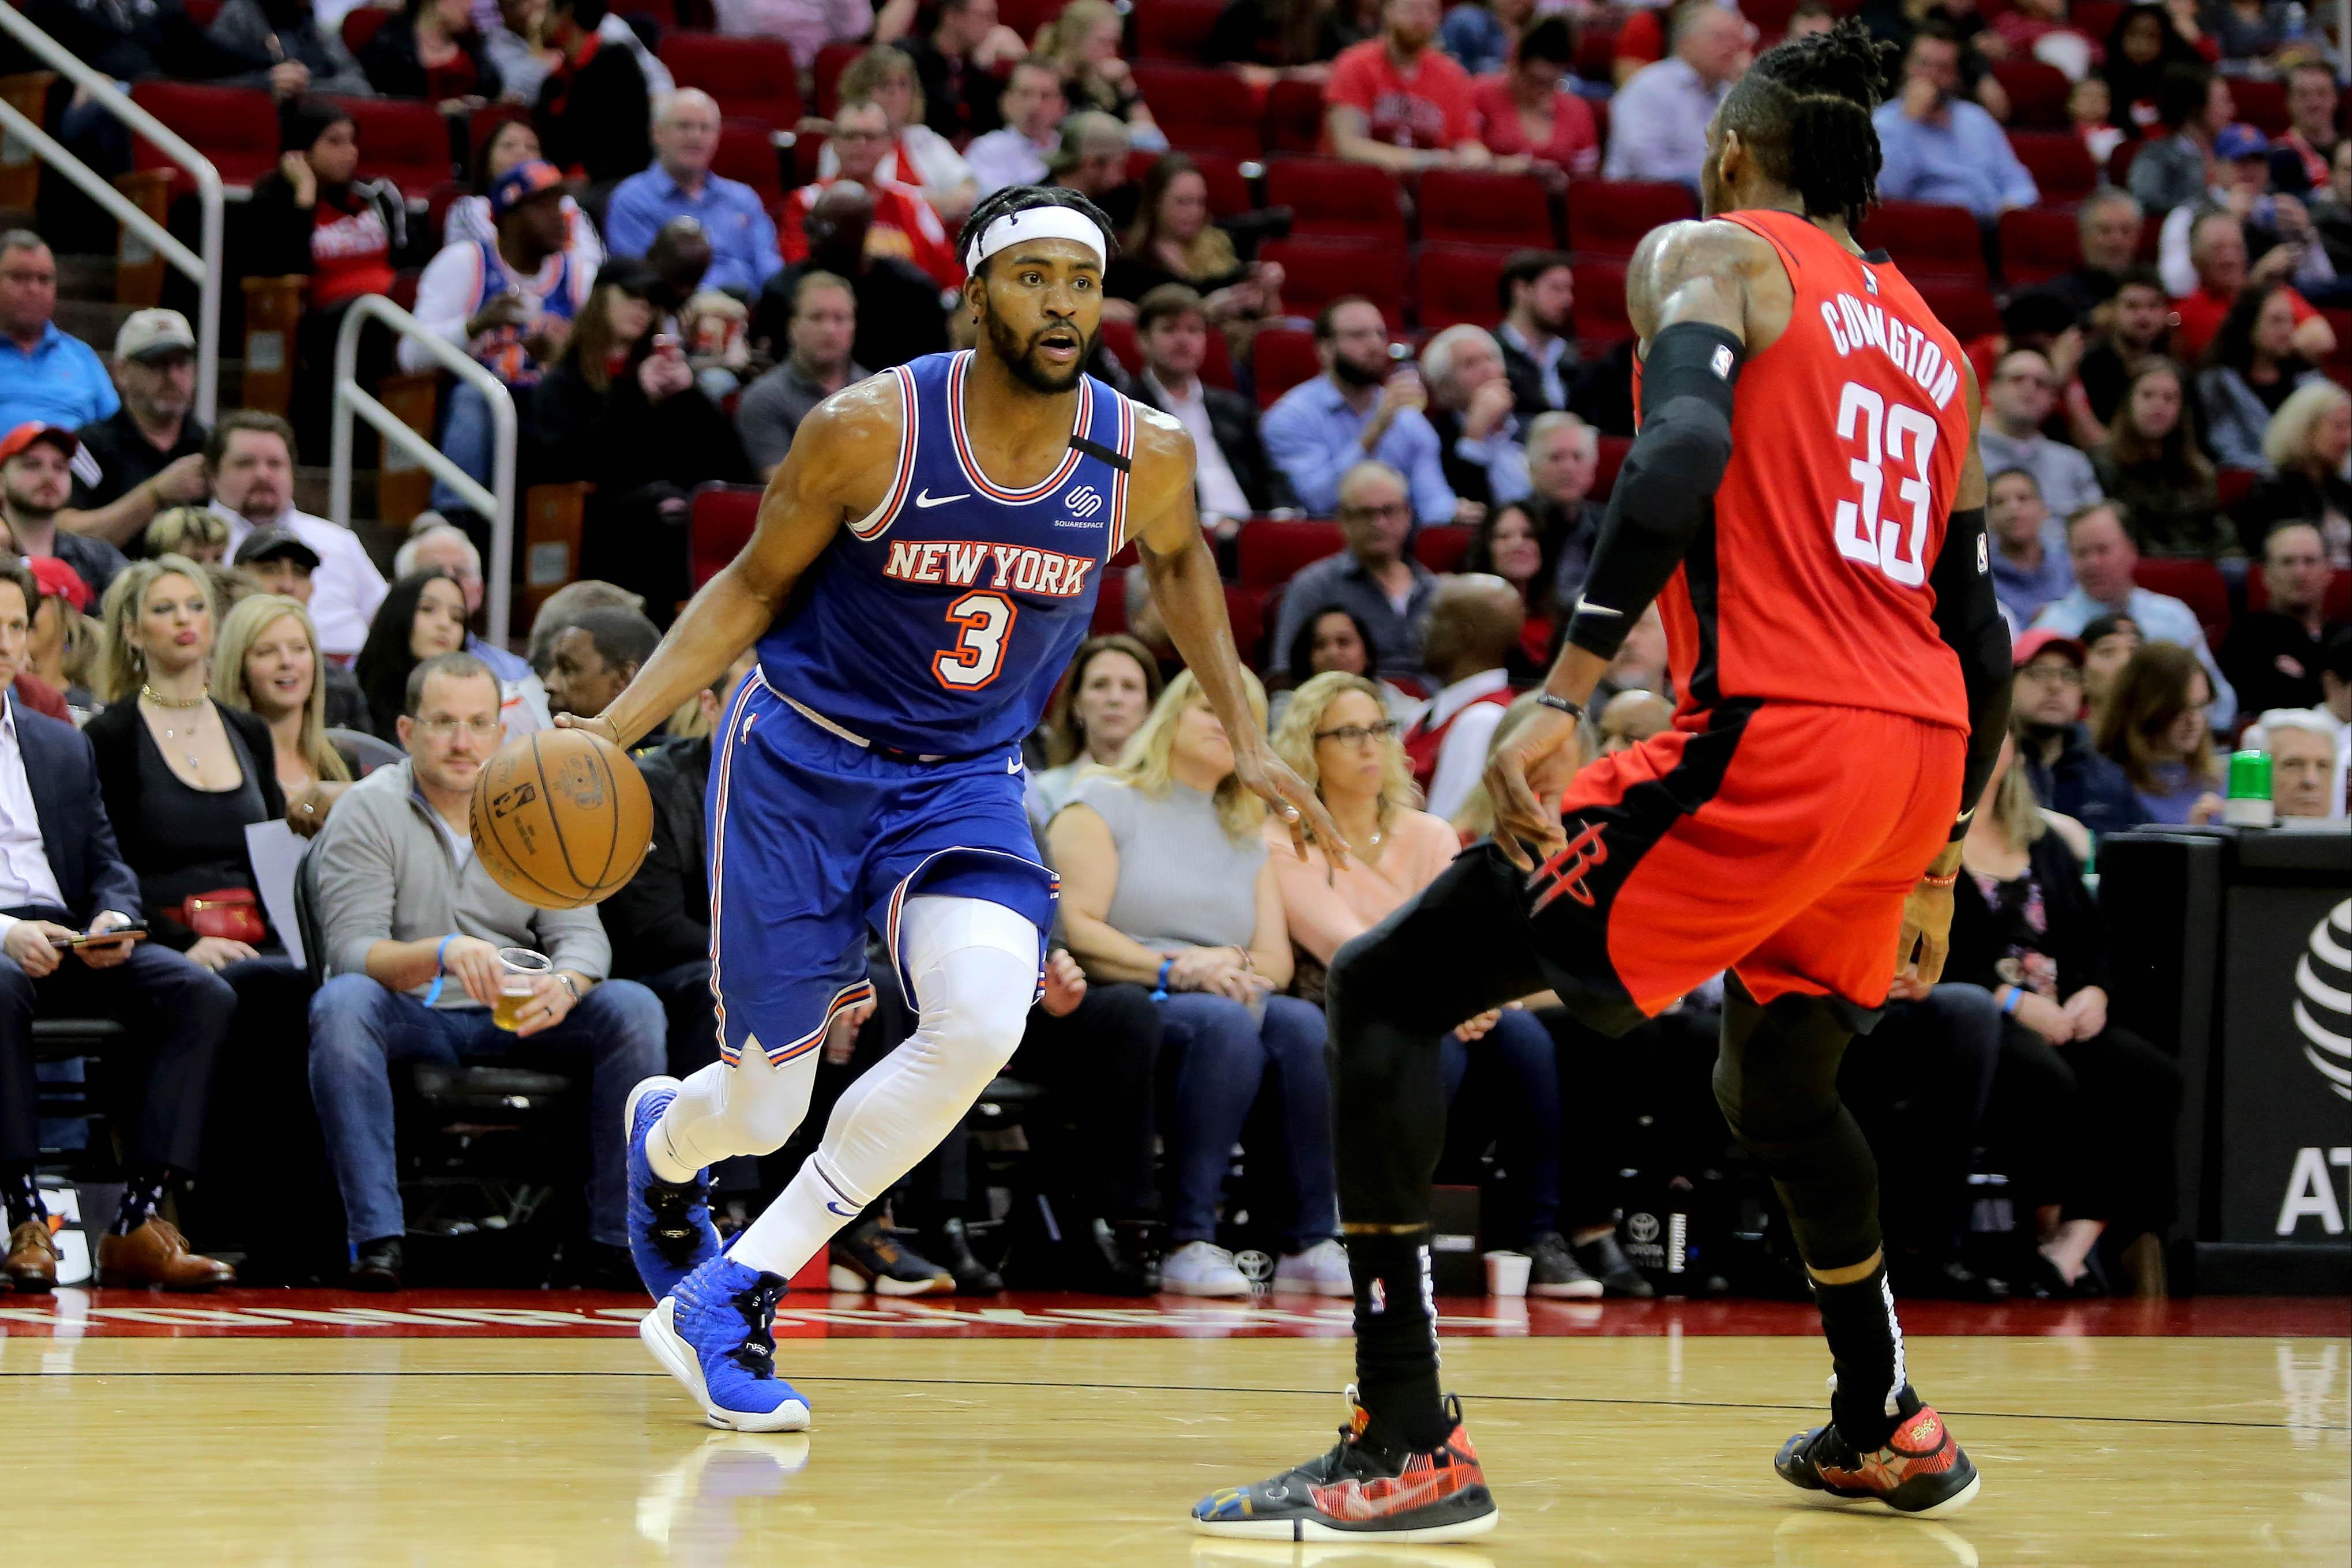 NBA: New York Knicks at Houston Rockets